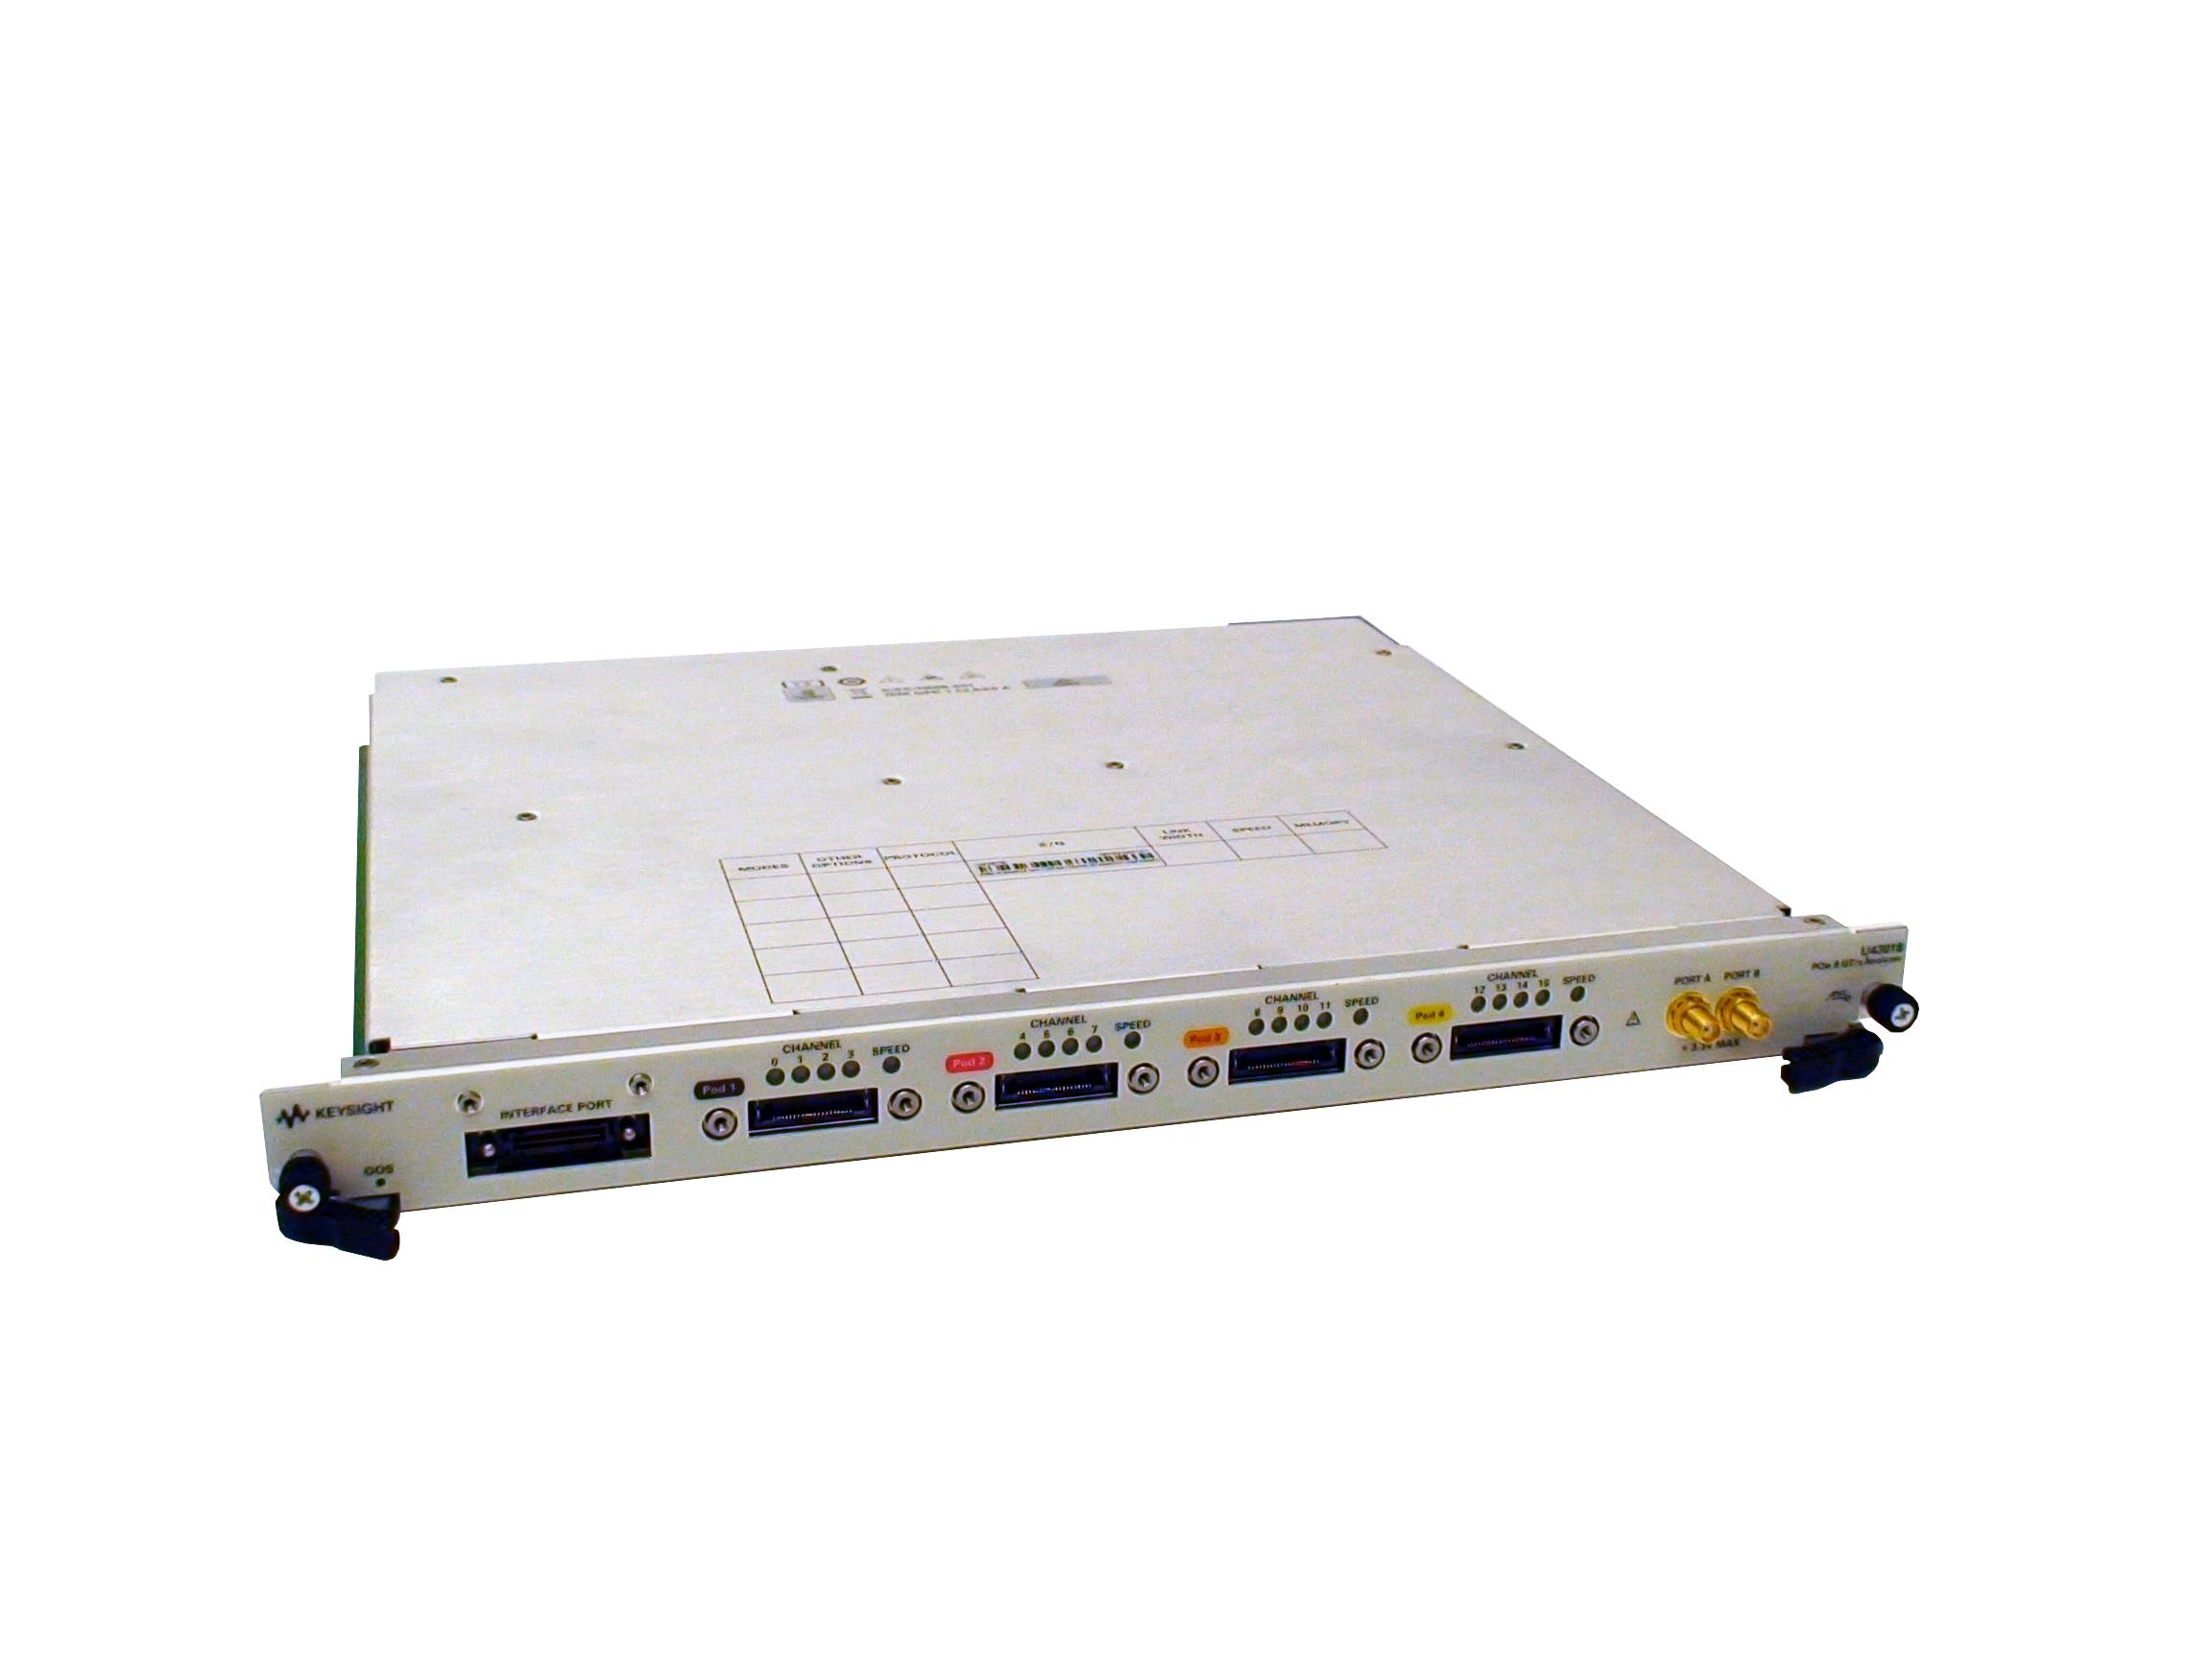 Keysight Technologies: решение для анализа сигналов протокола PCIe Gen3